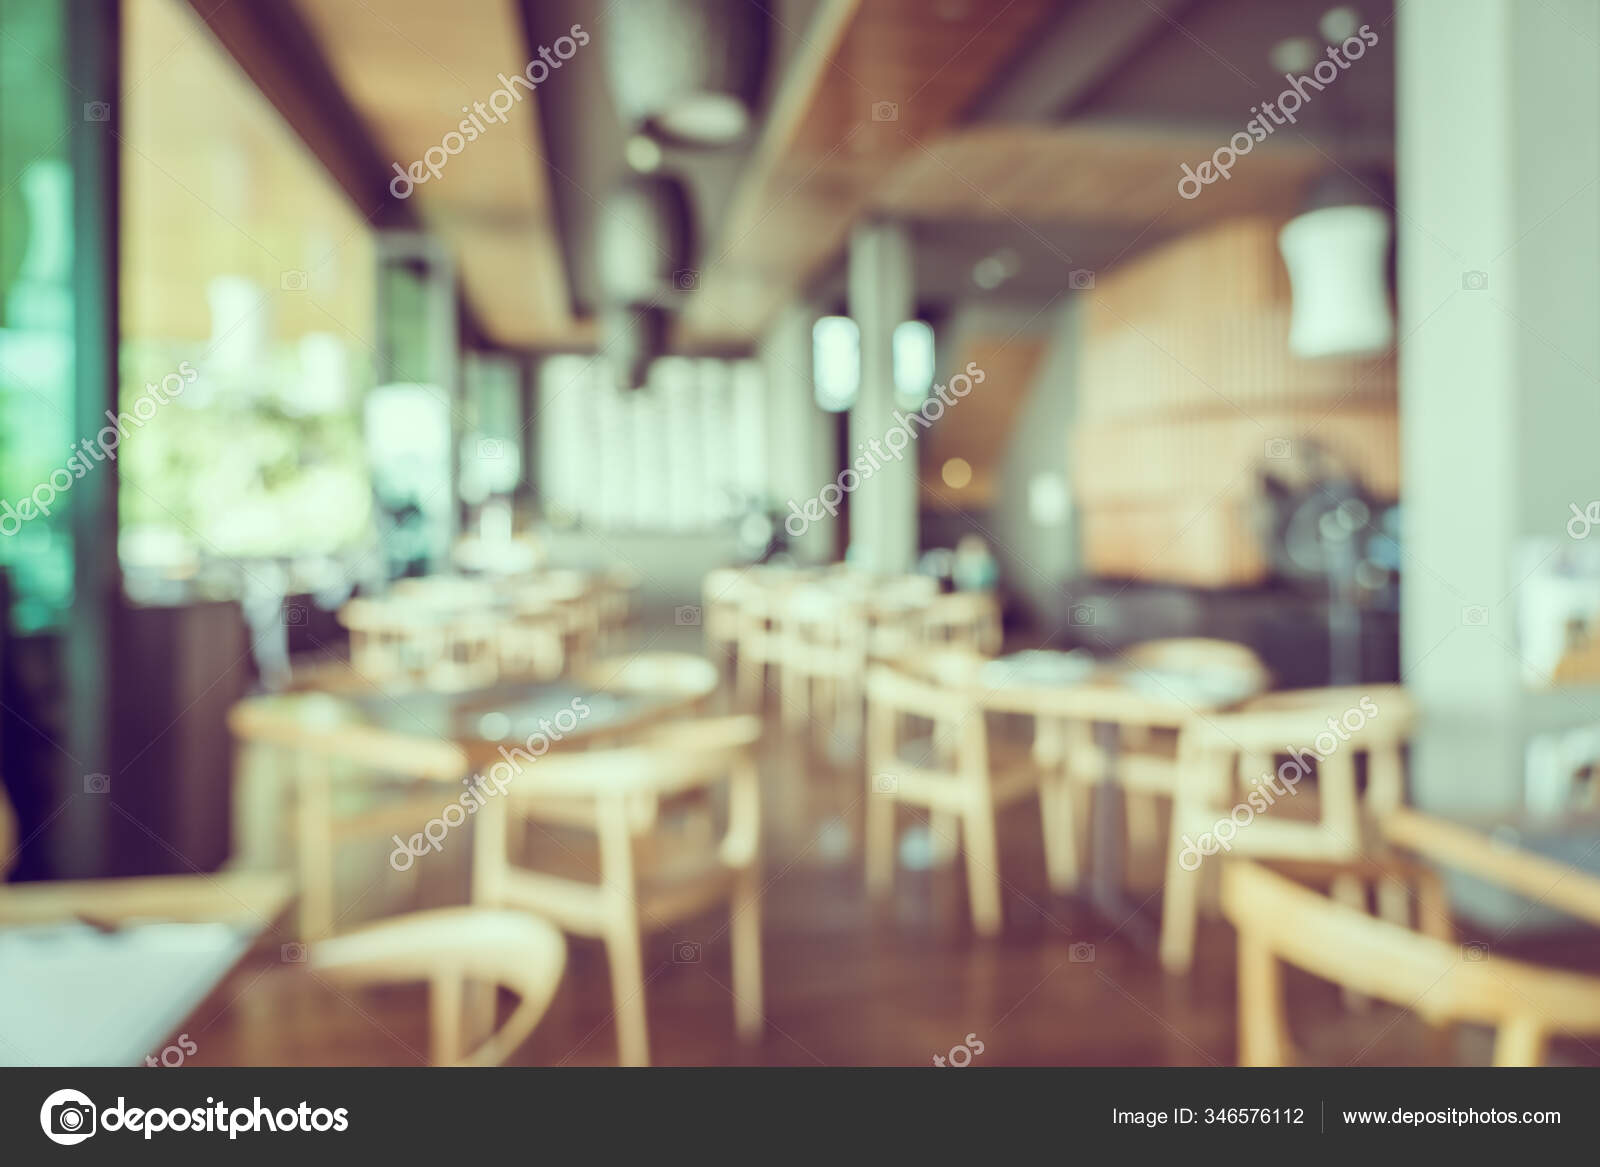 Abstract Blur Restaurant Interior Coffee Shop Cafe Background Stock Photo C Mrsiraphol 346576112